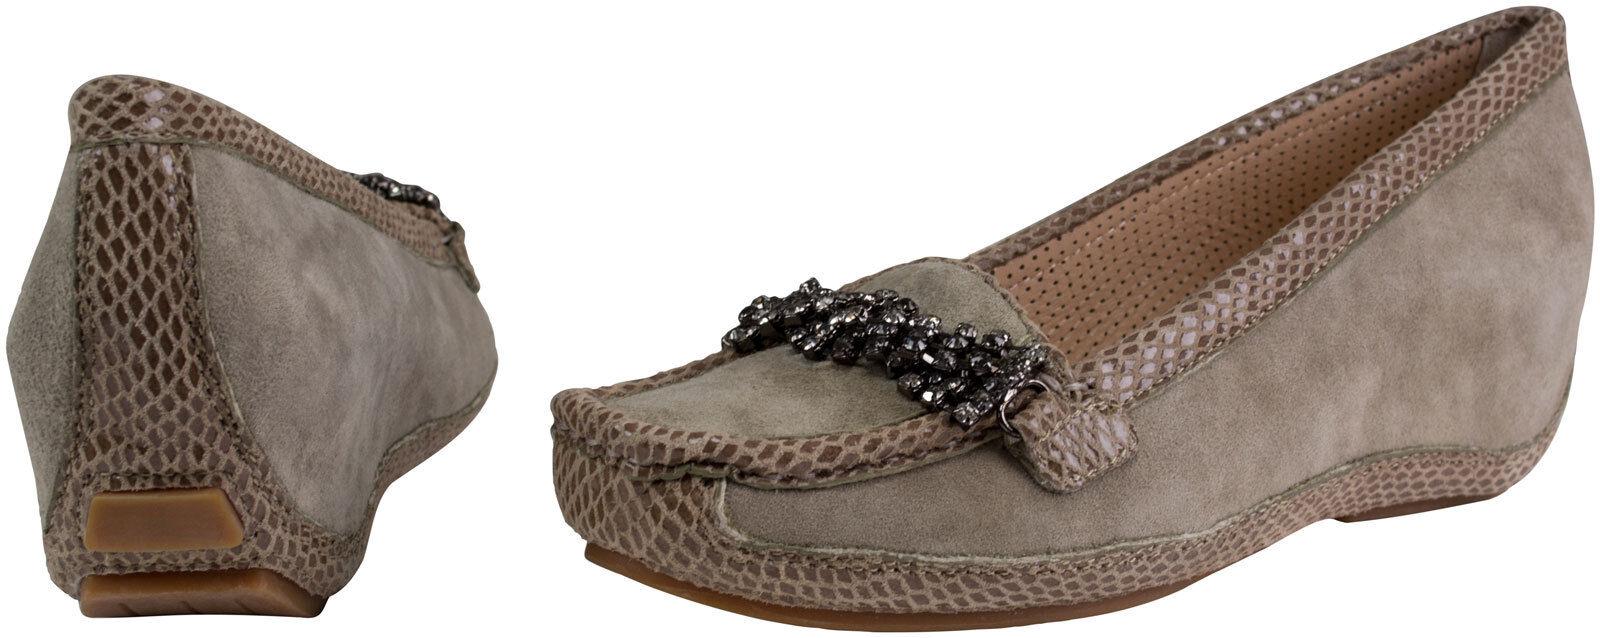 Pump Platform scarpe, Wedge -Moccasins Taupe   Beige Wedge Heel Glitter Buckle  vendite online